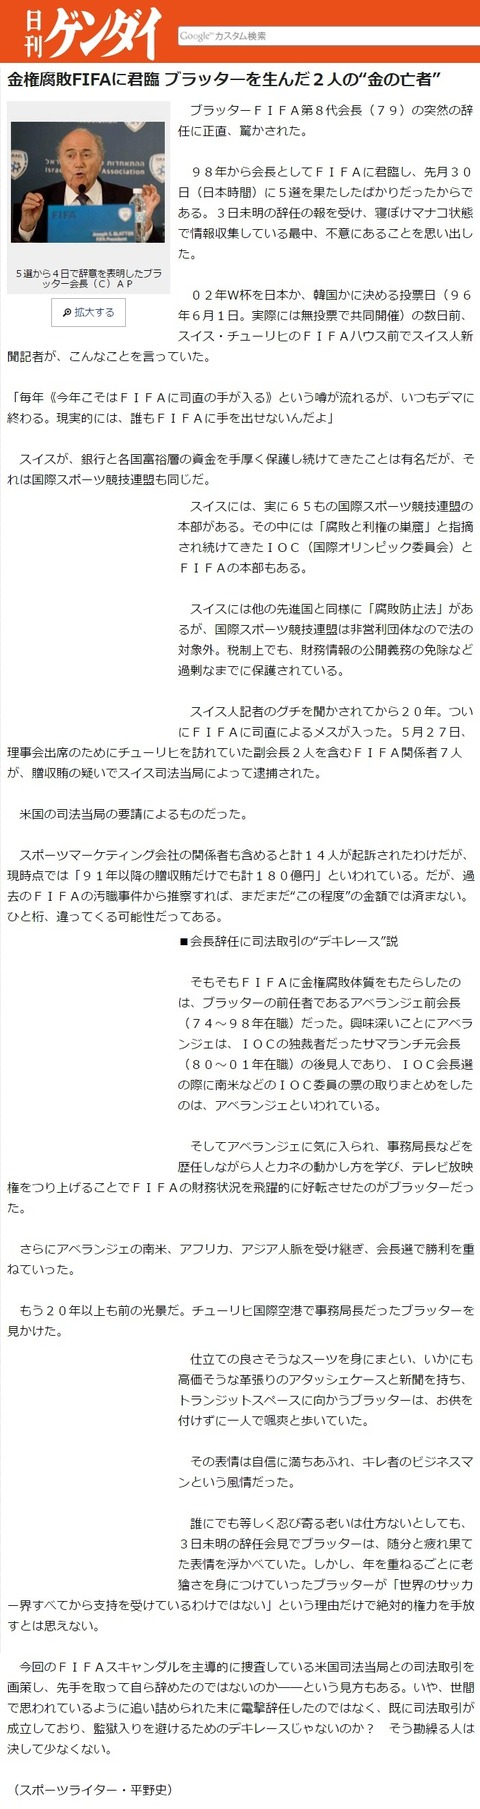 WC2002日韓同時開催姦国が日本の単独開催の阻止を賄賂で仕掛けた3